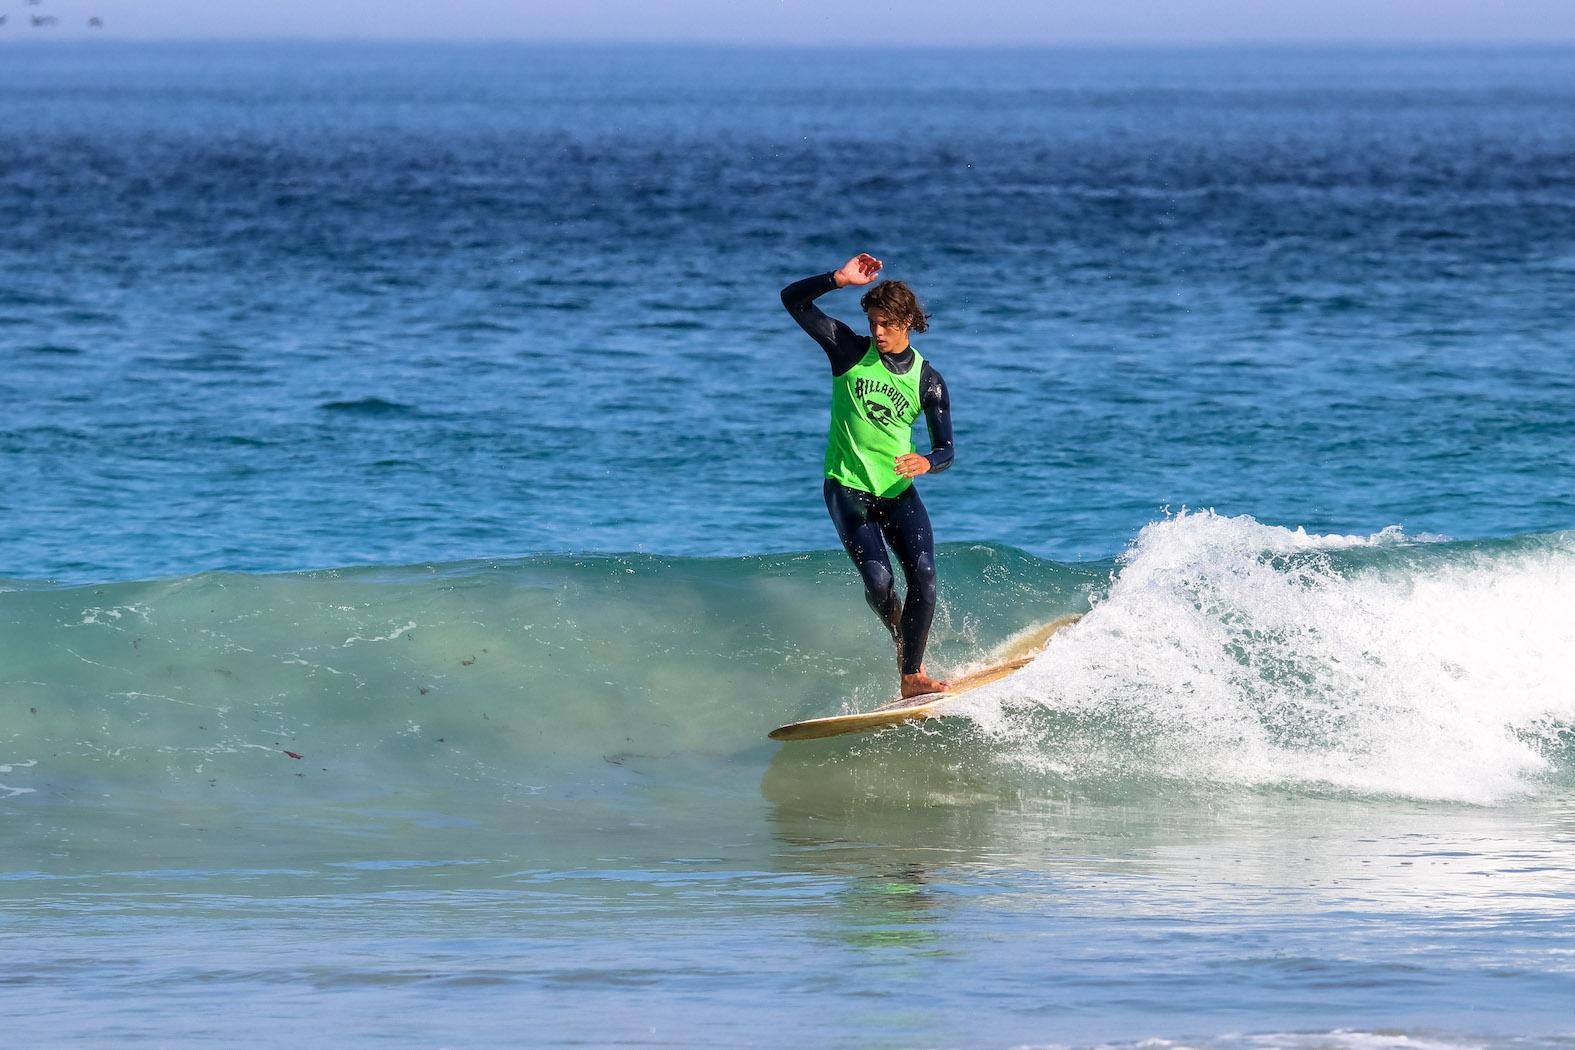 Surfing skills showcased at Rolling Retro Reggae Revival